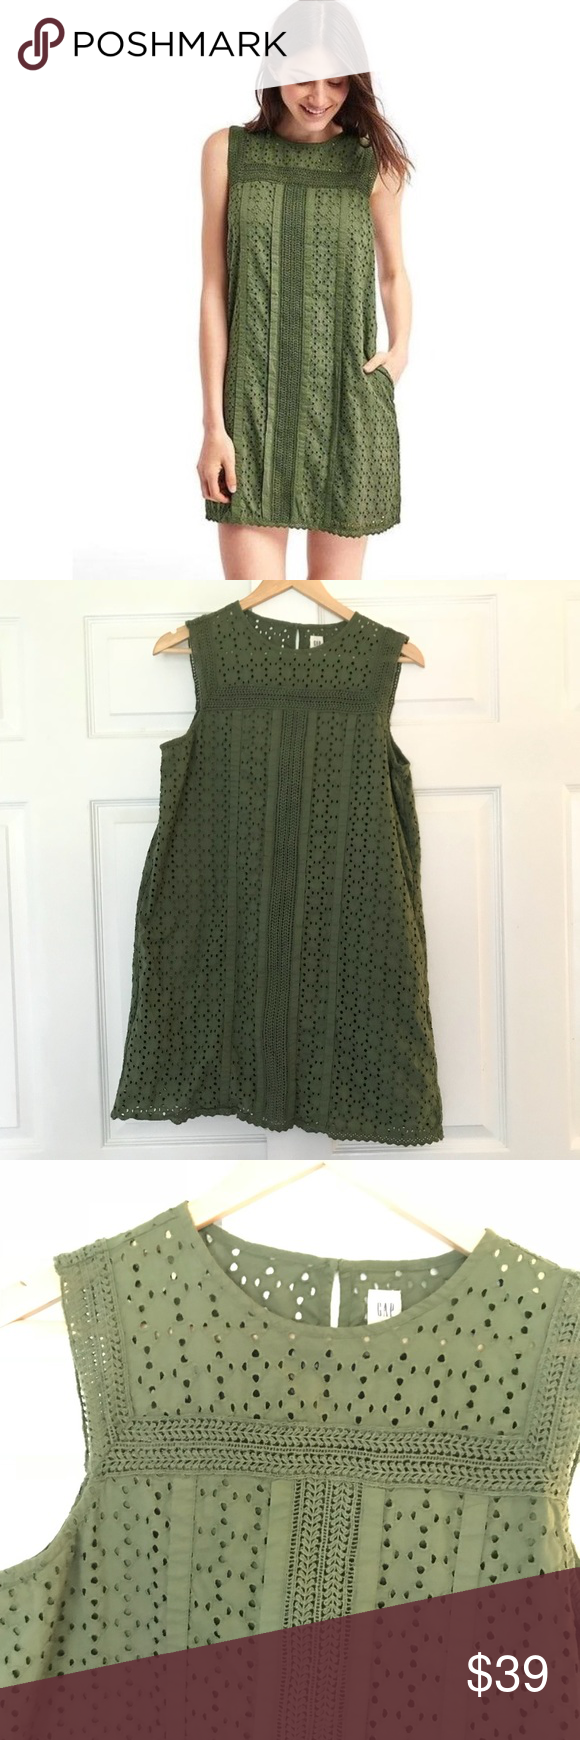 Gap Olive Green Eyelet Shift Dress Euc Clothes Design Shift Dress Gap Dress [ 1740 x 580 Pixel ]